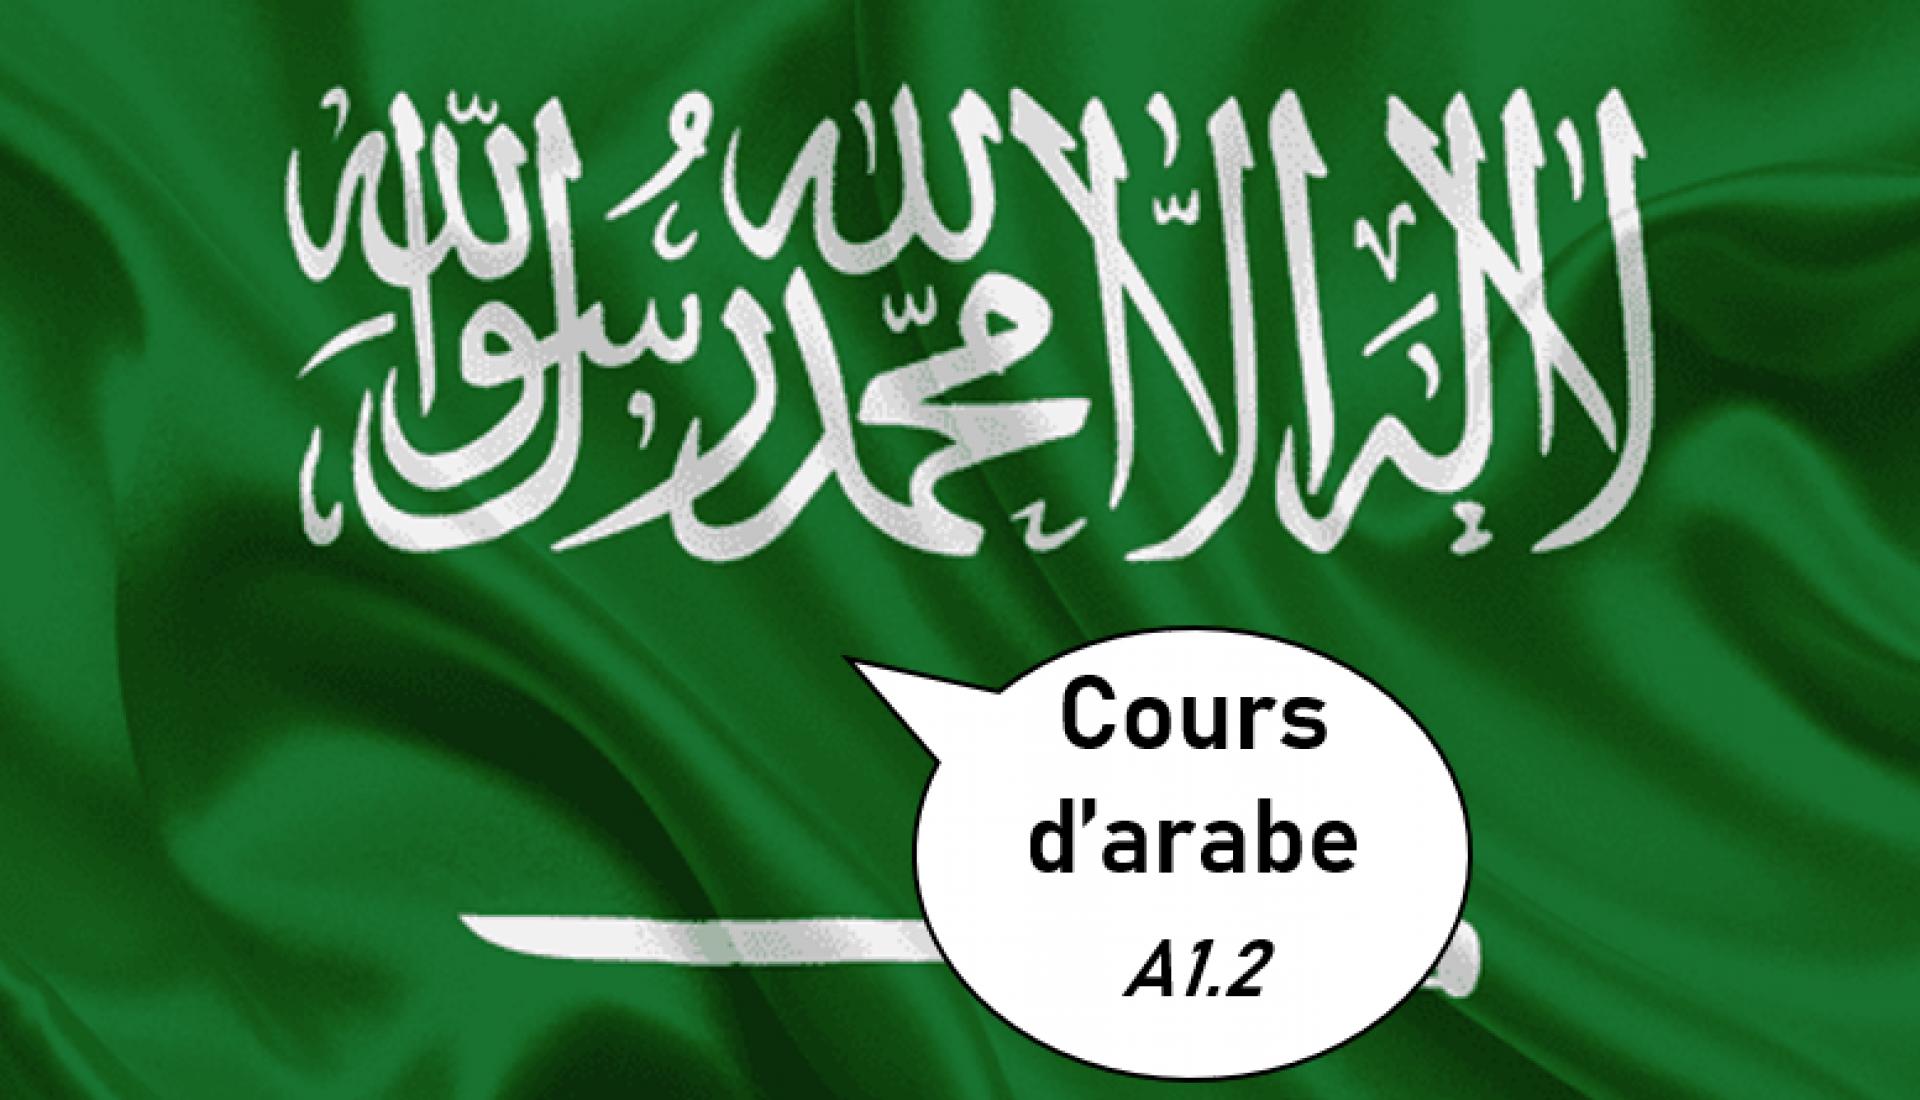 Arabe A1.2